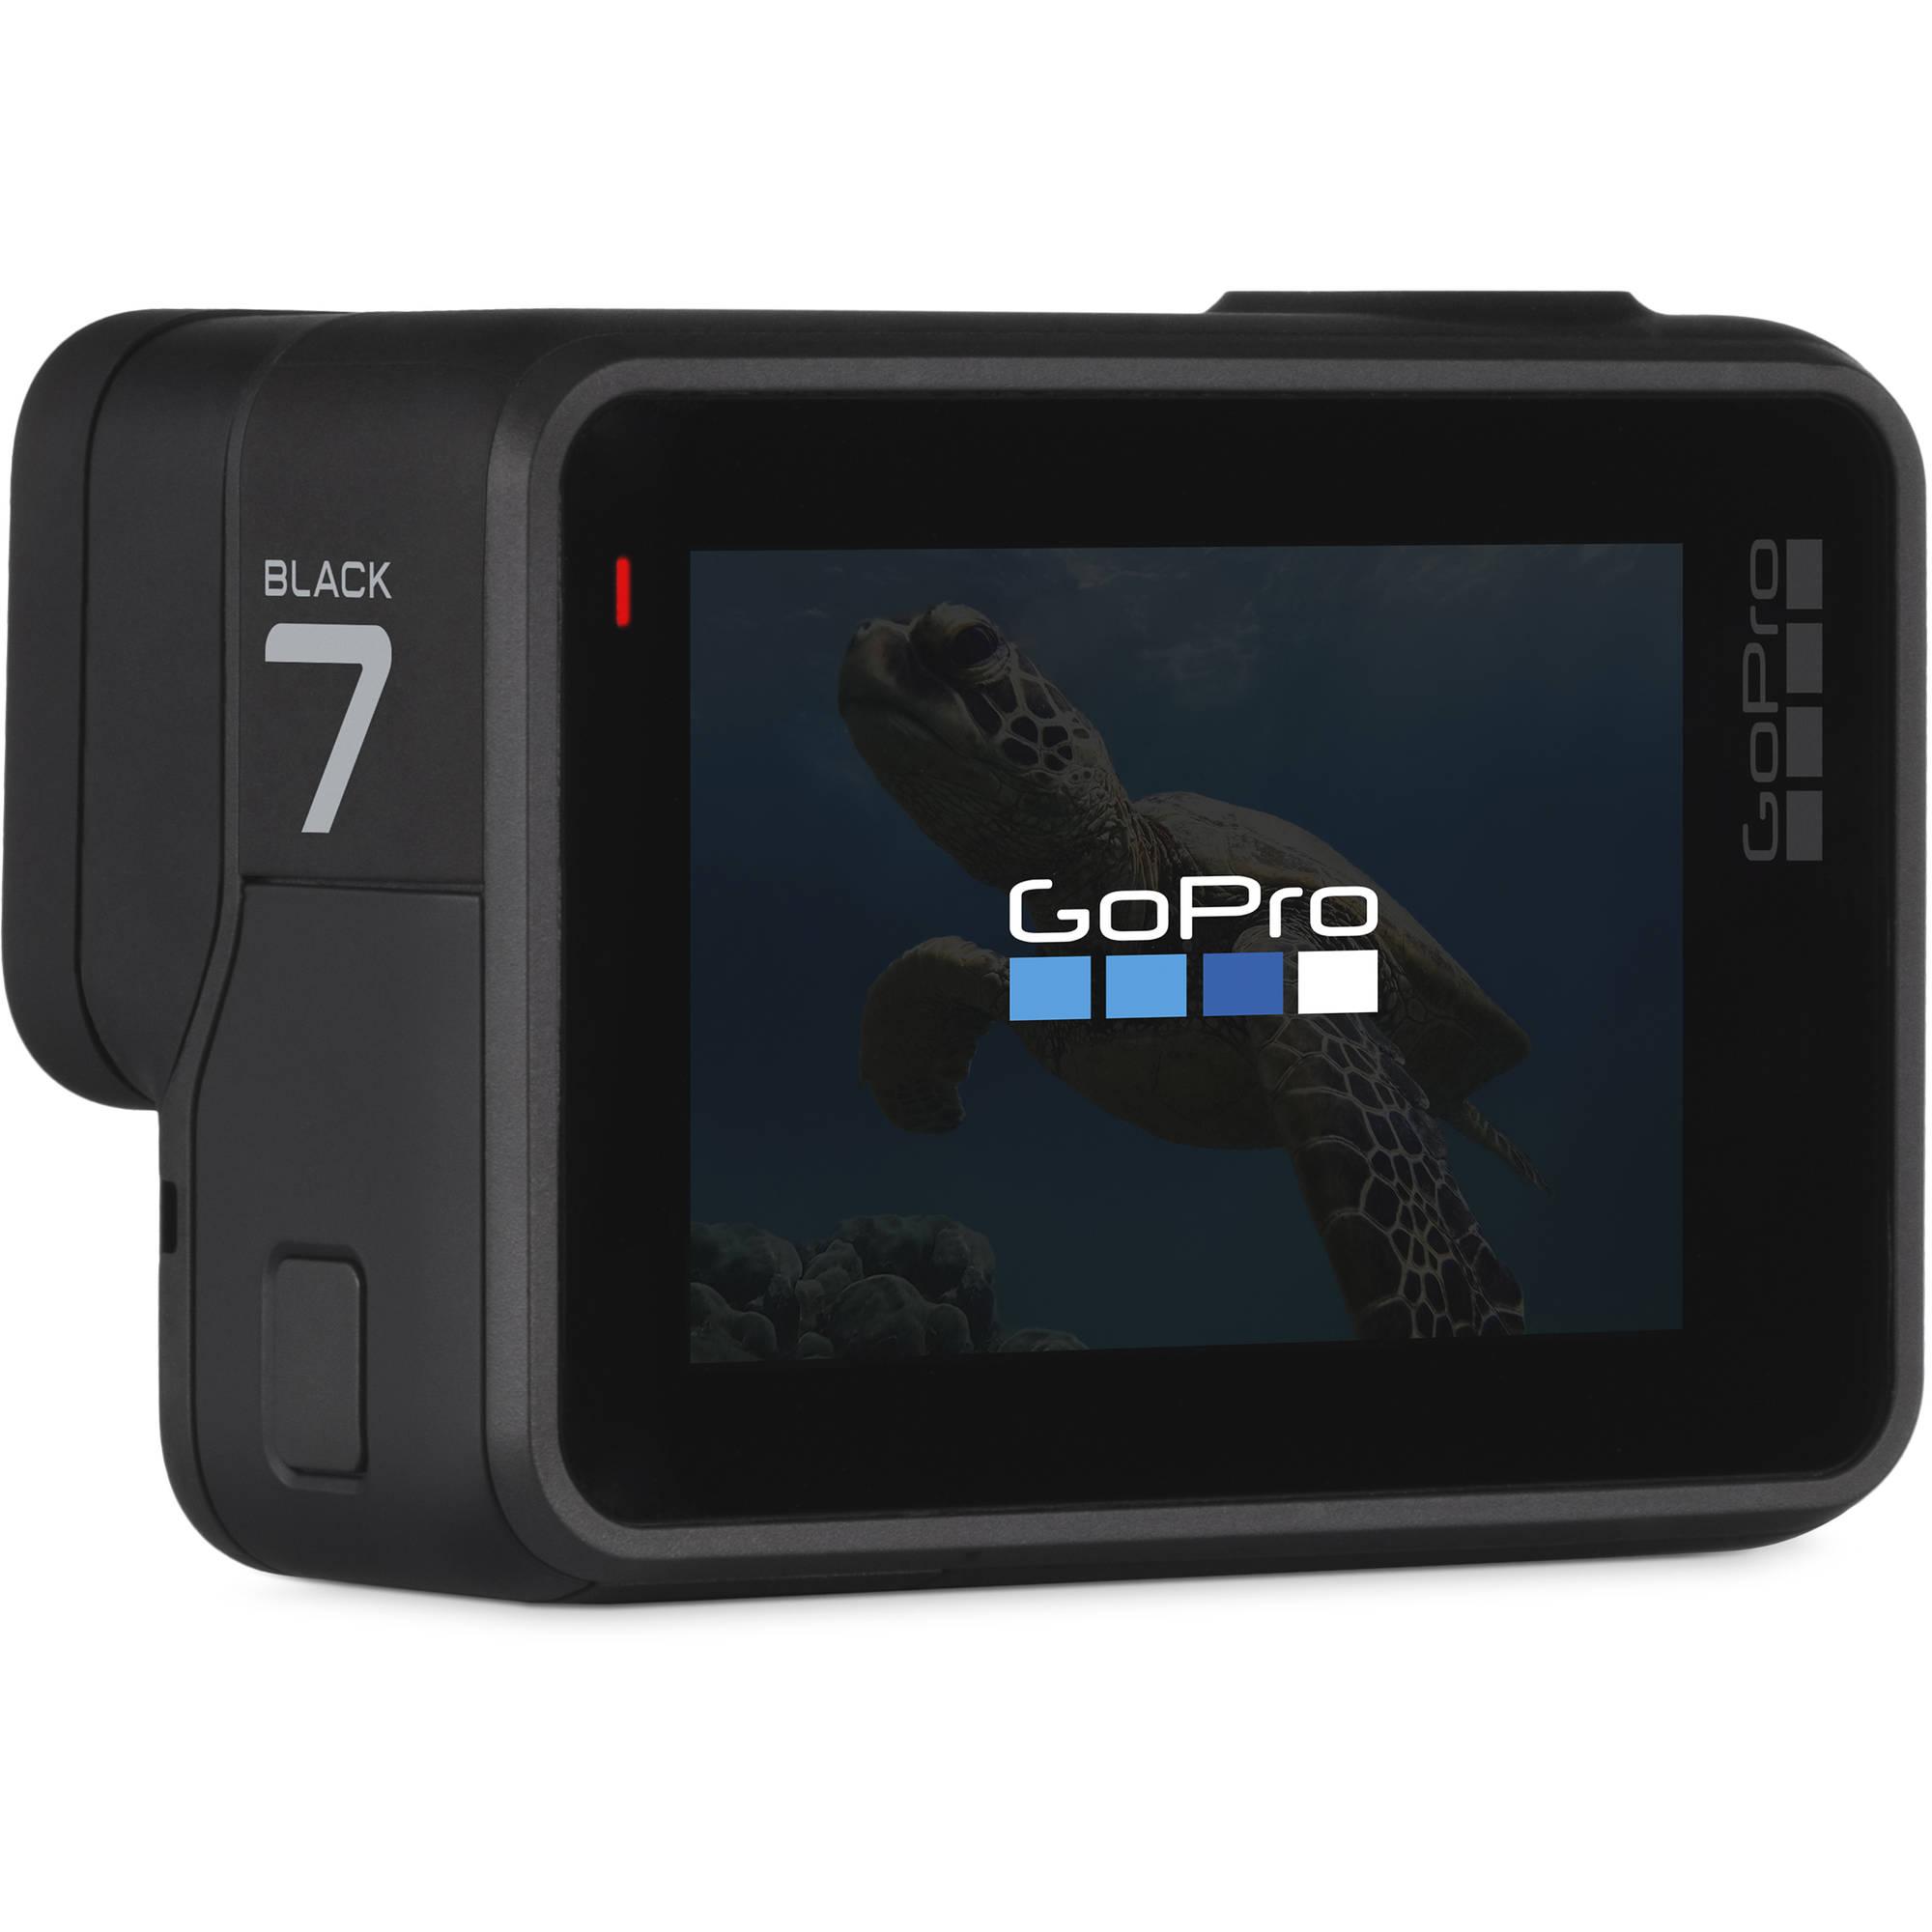 gopro app for windows 7 64 bit